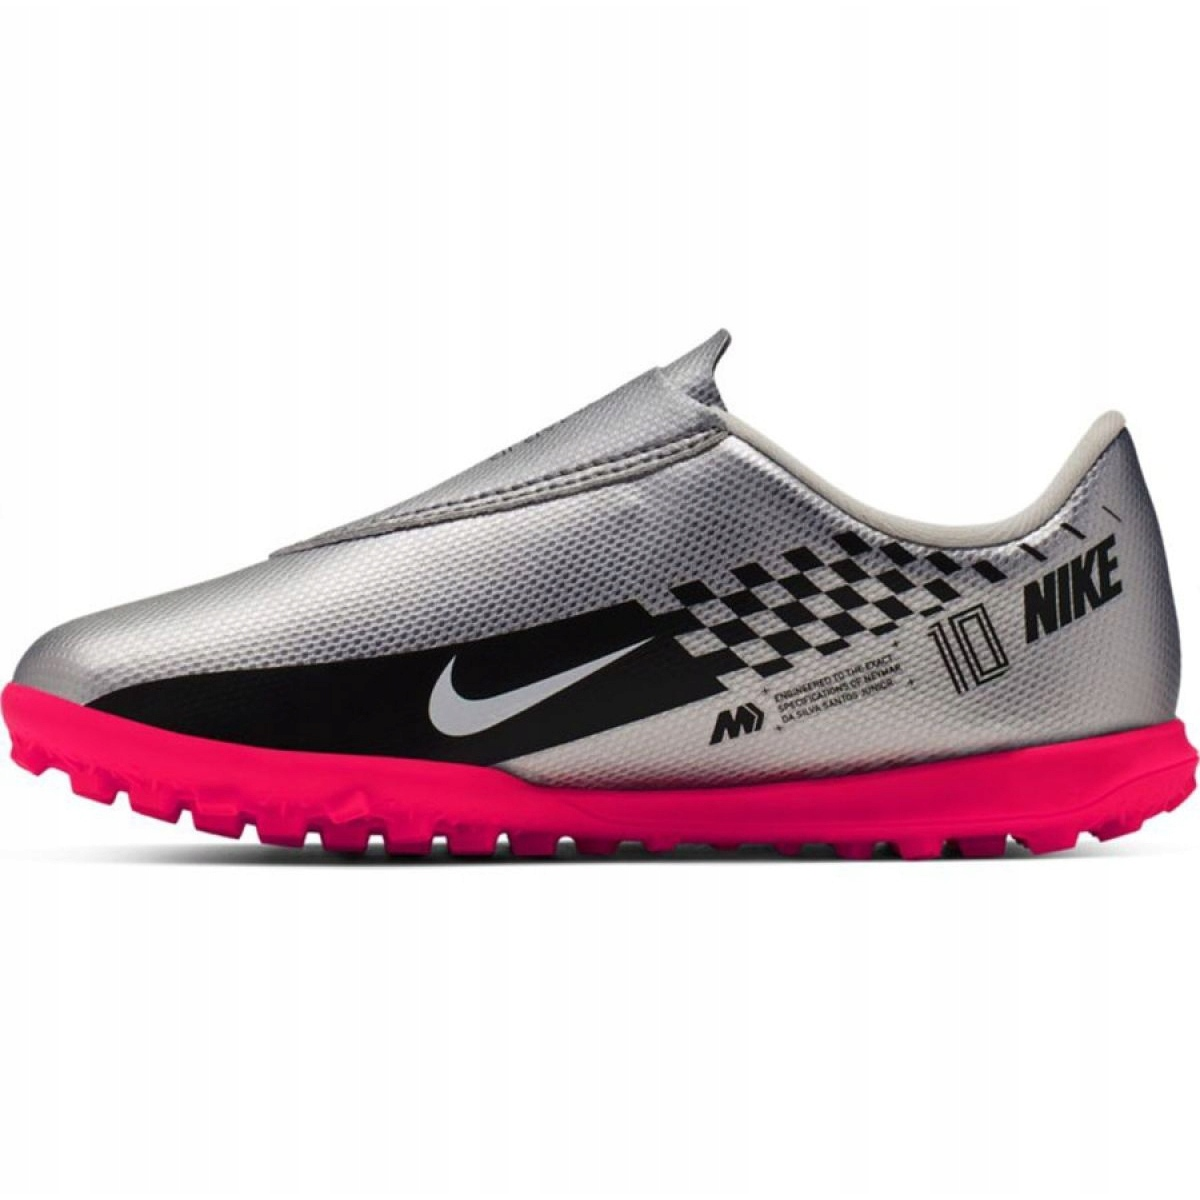 Sapatilhas Nike Mercurial Vapor 13 Club Tf Neymar Jr AT8176 006 cinza cinza prata